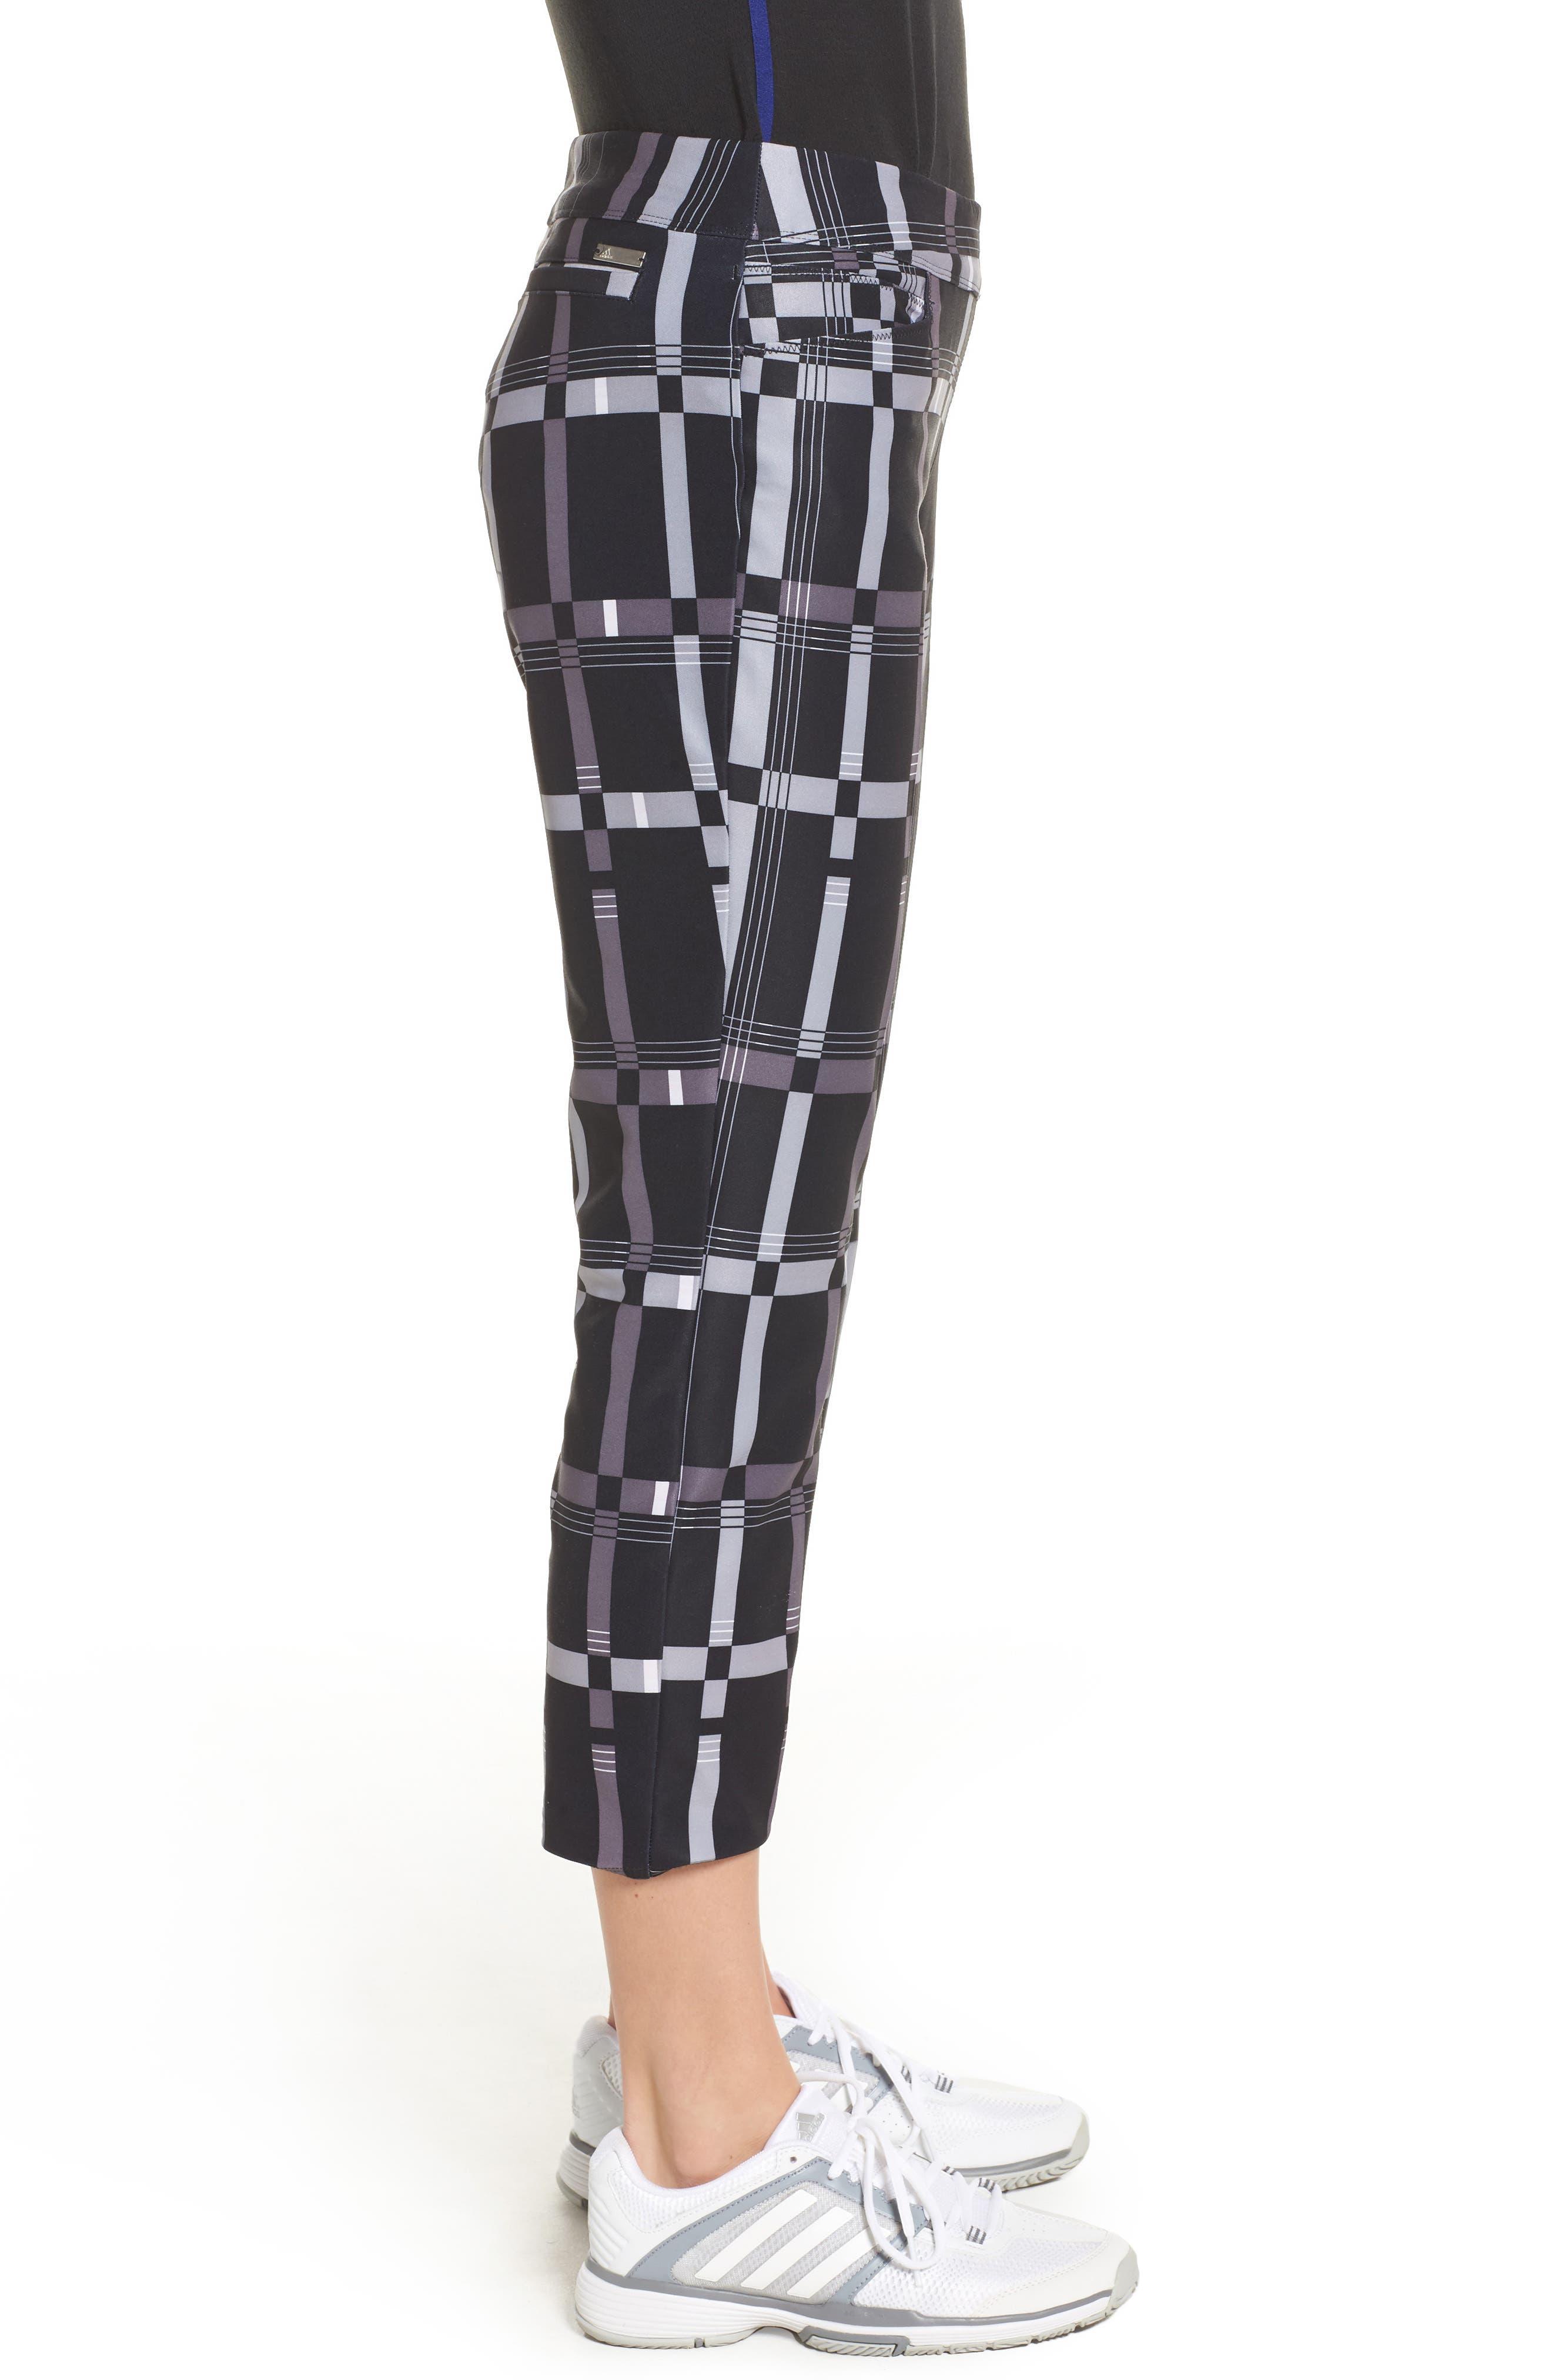 adistar Ankle Pants,                             Alternate thumbnail 3, color,                             Black